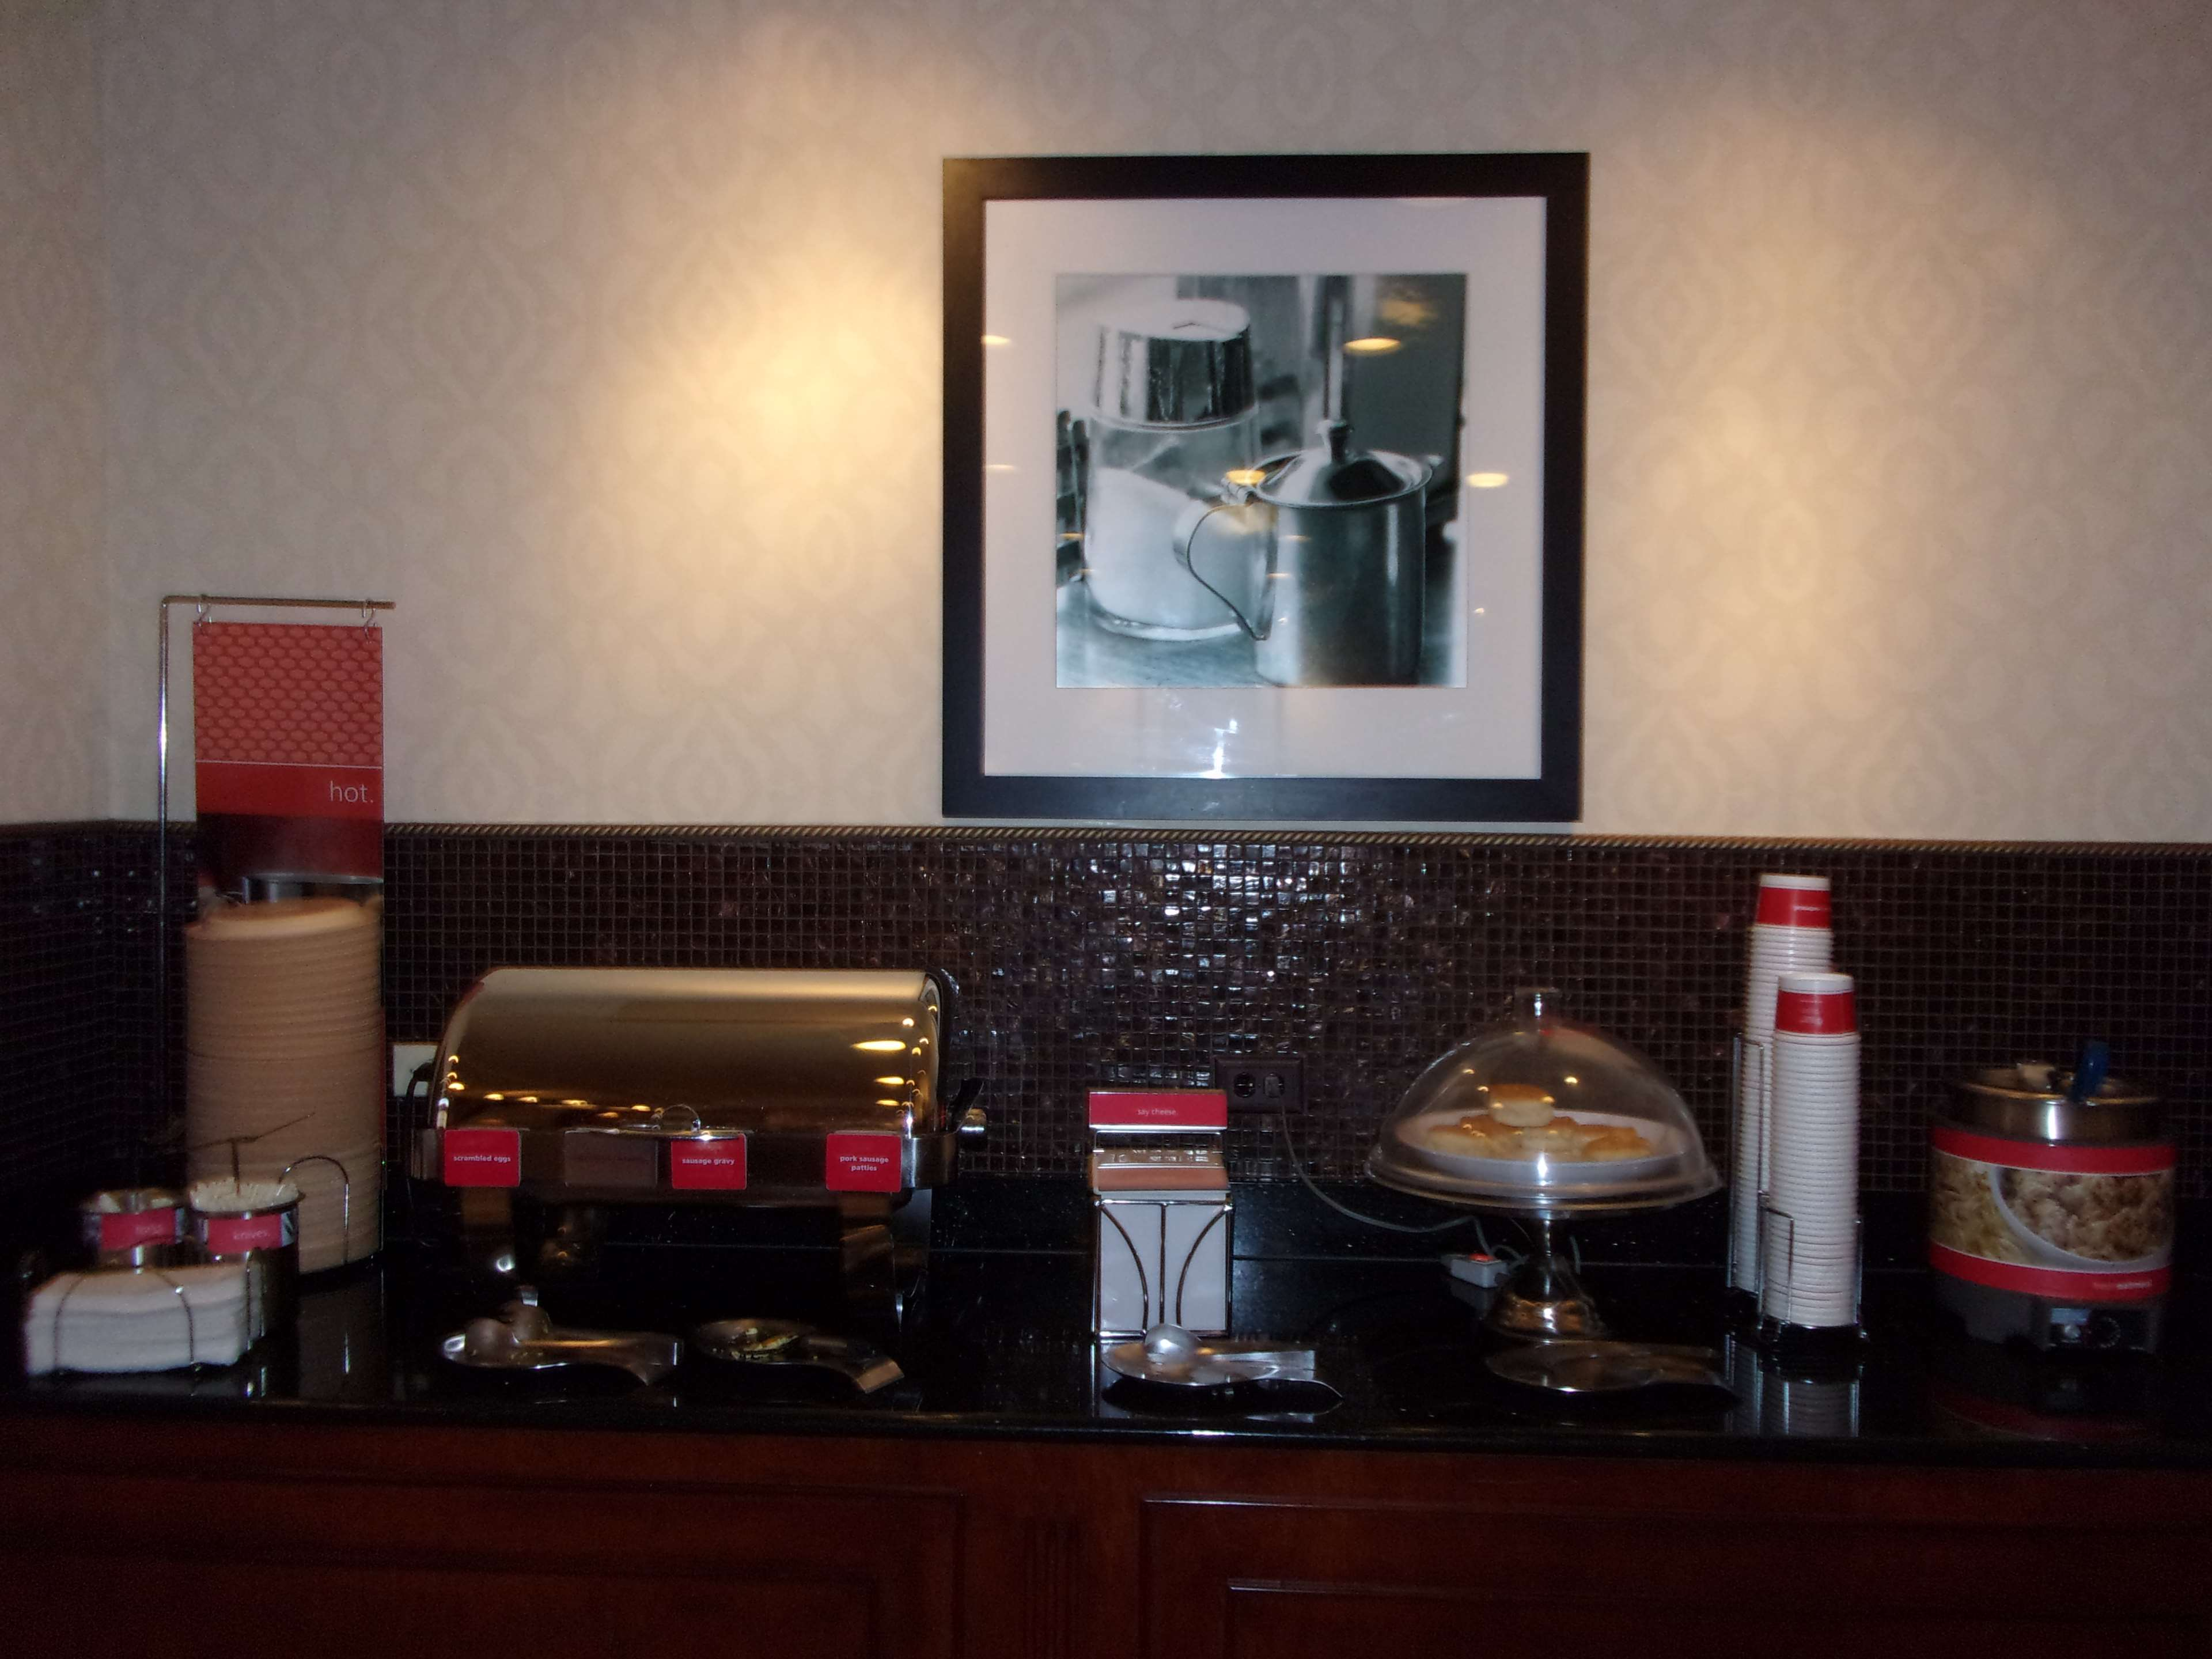 Hampton Inn & Suites Bolingbrook image 23